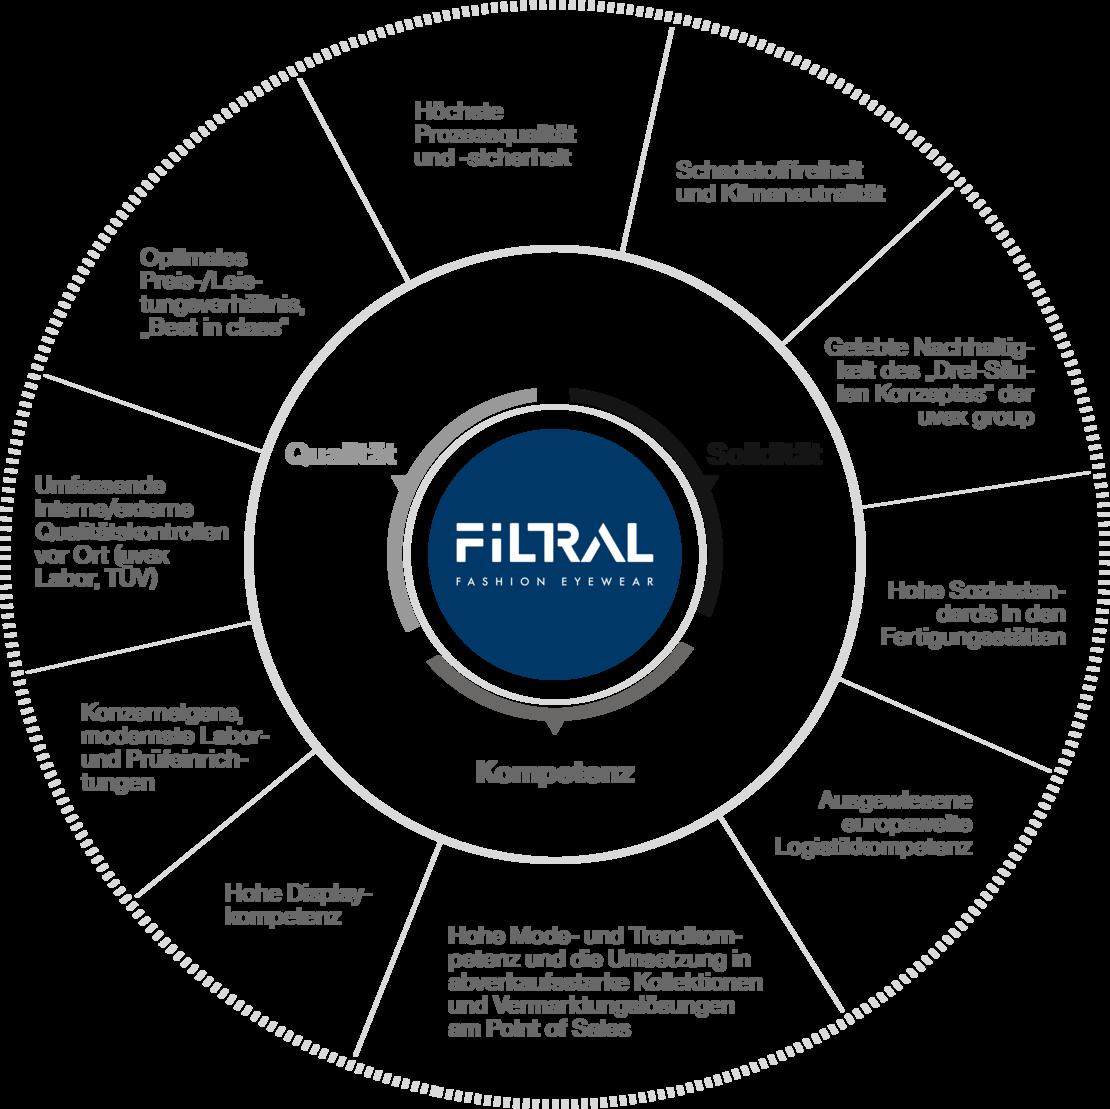 Grafik, Unternehmenswerte Filtral